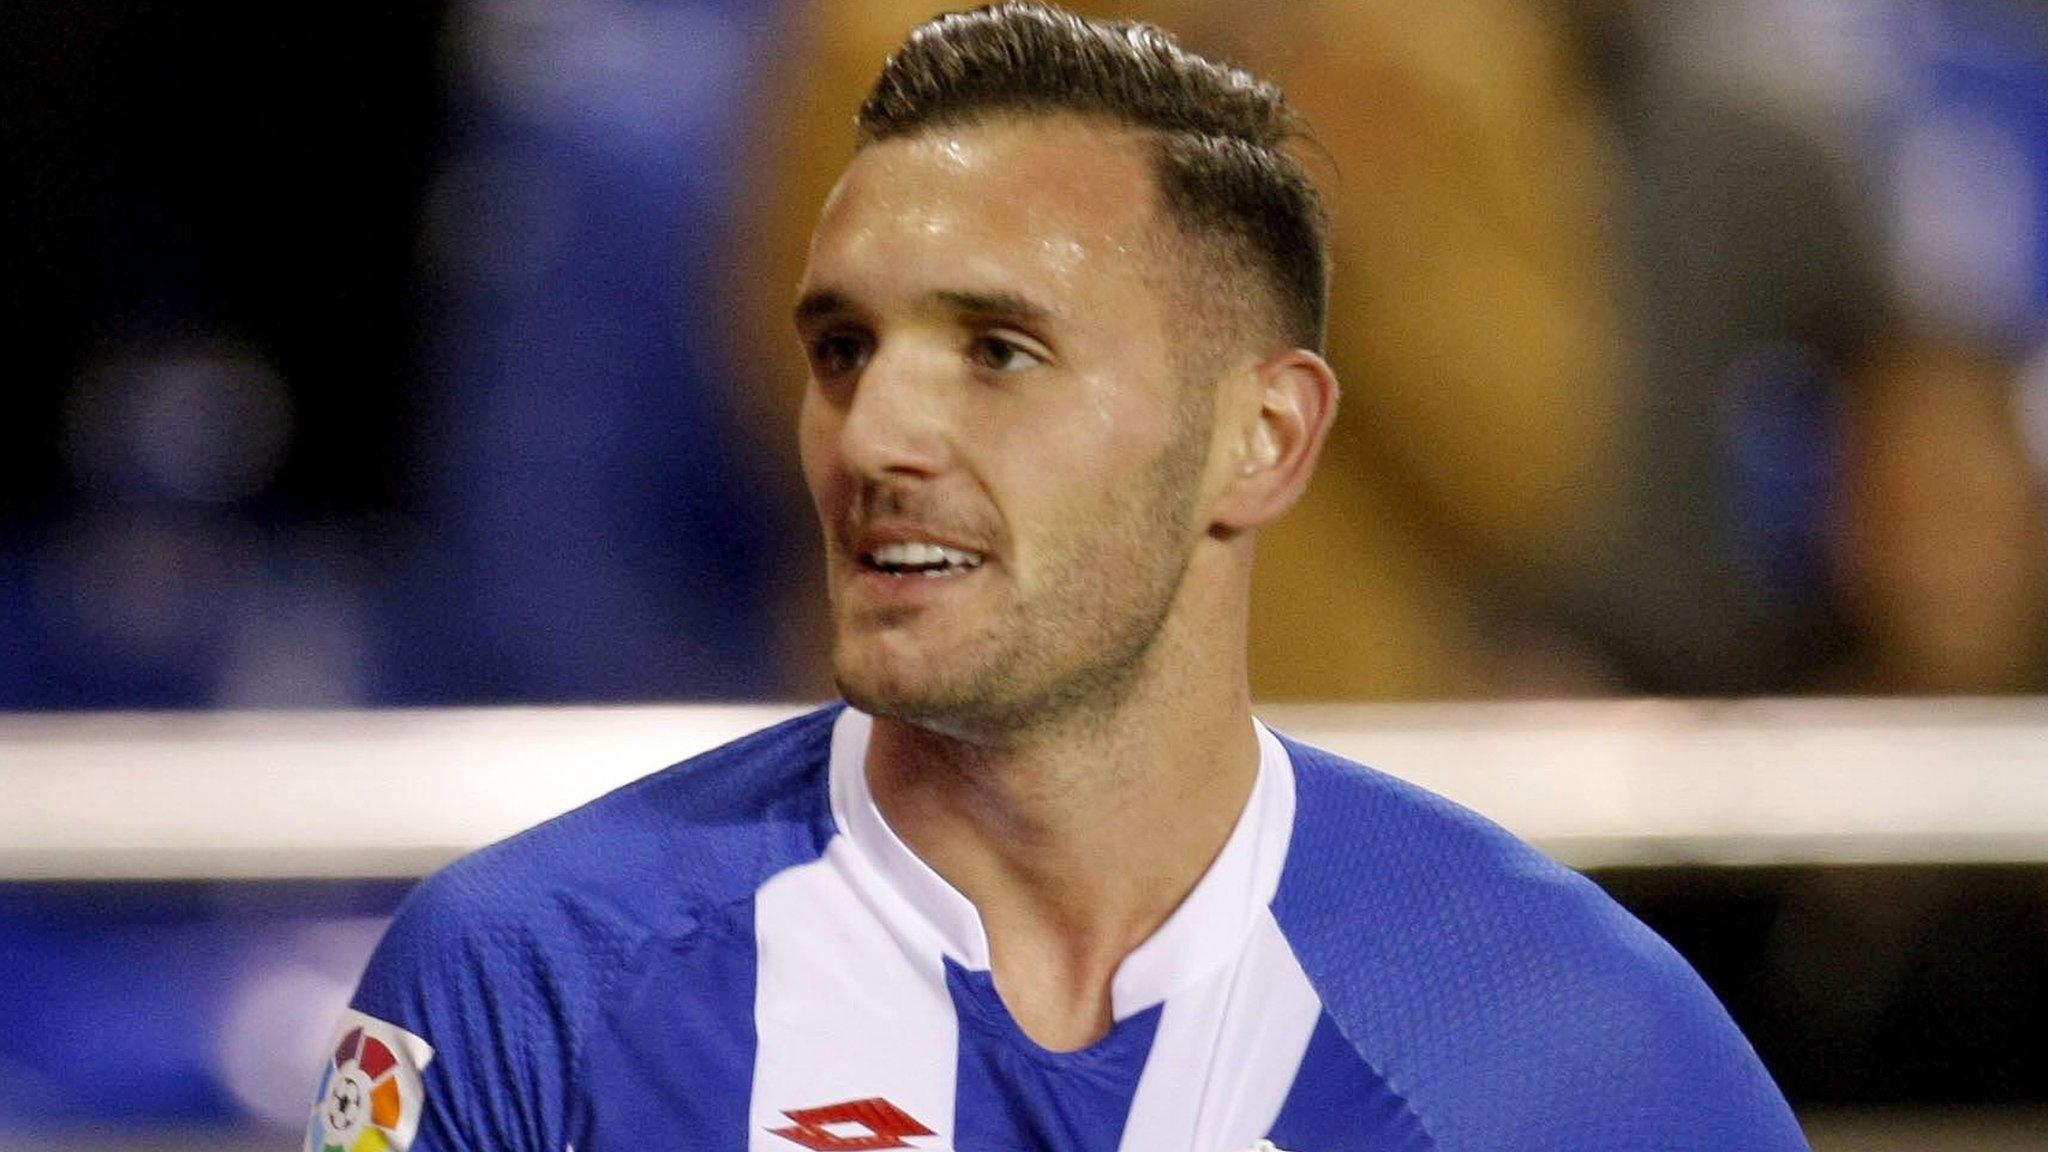 Premier League clubs spend record £1bn in summer transfer window